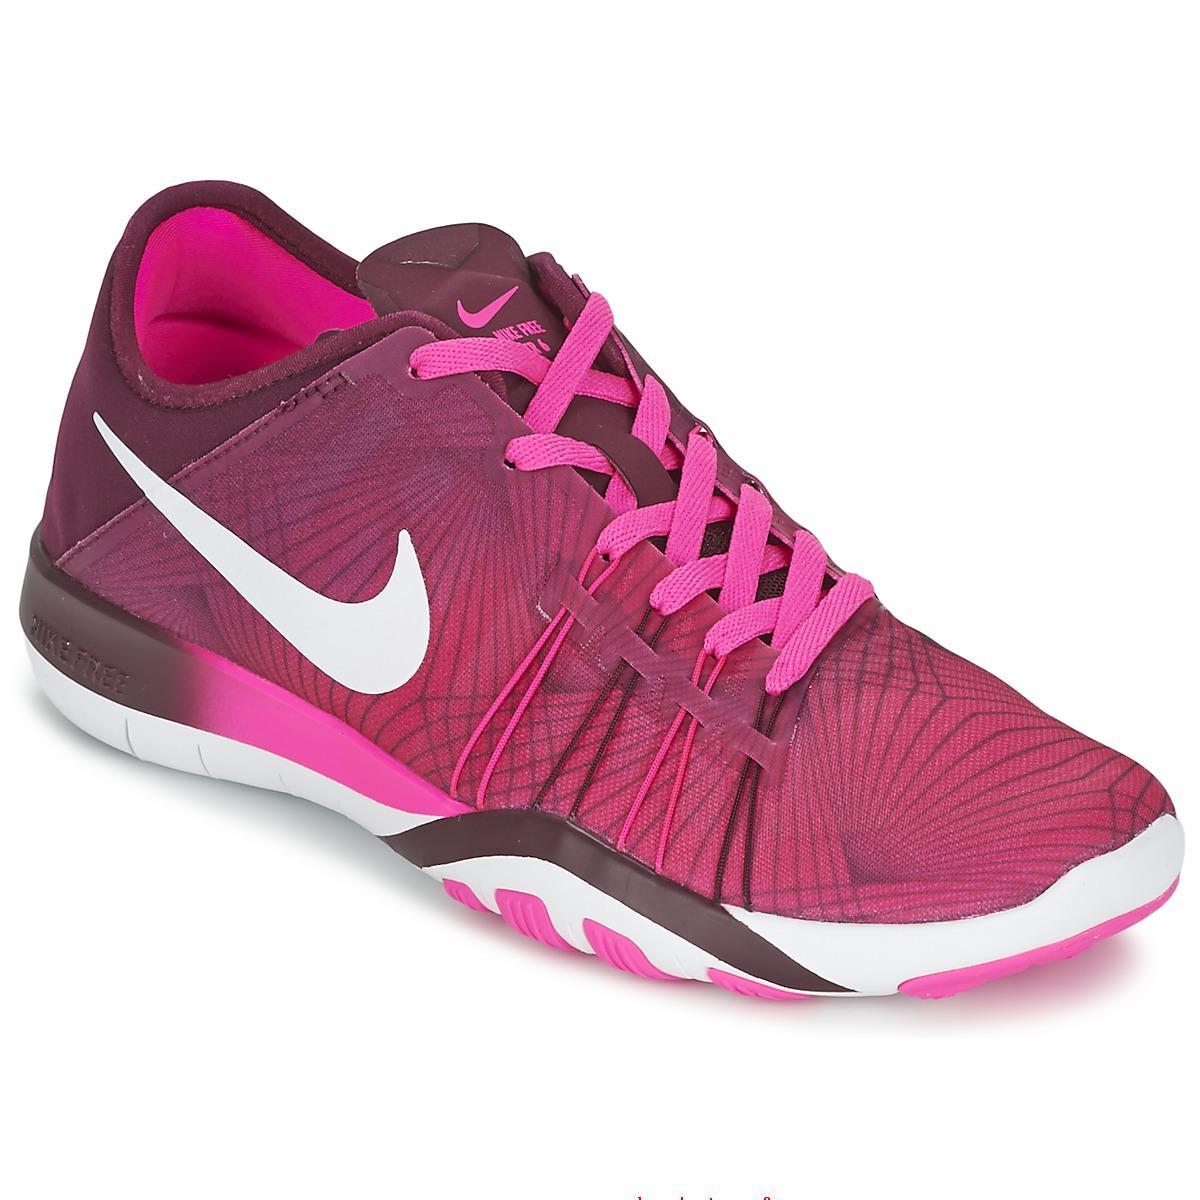 Chaussures running femme lille